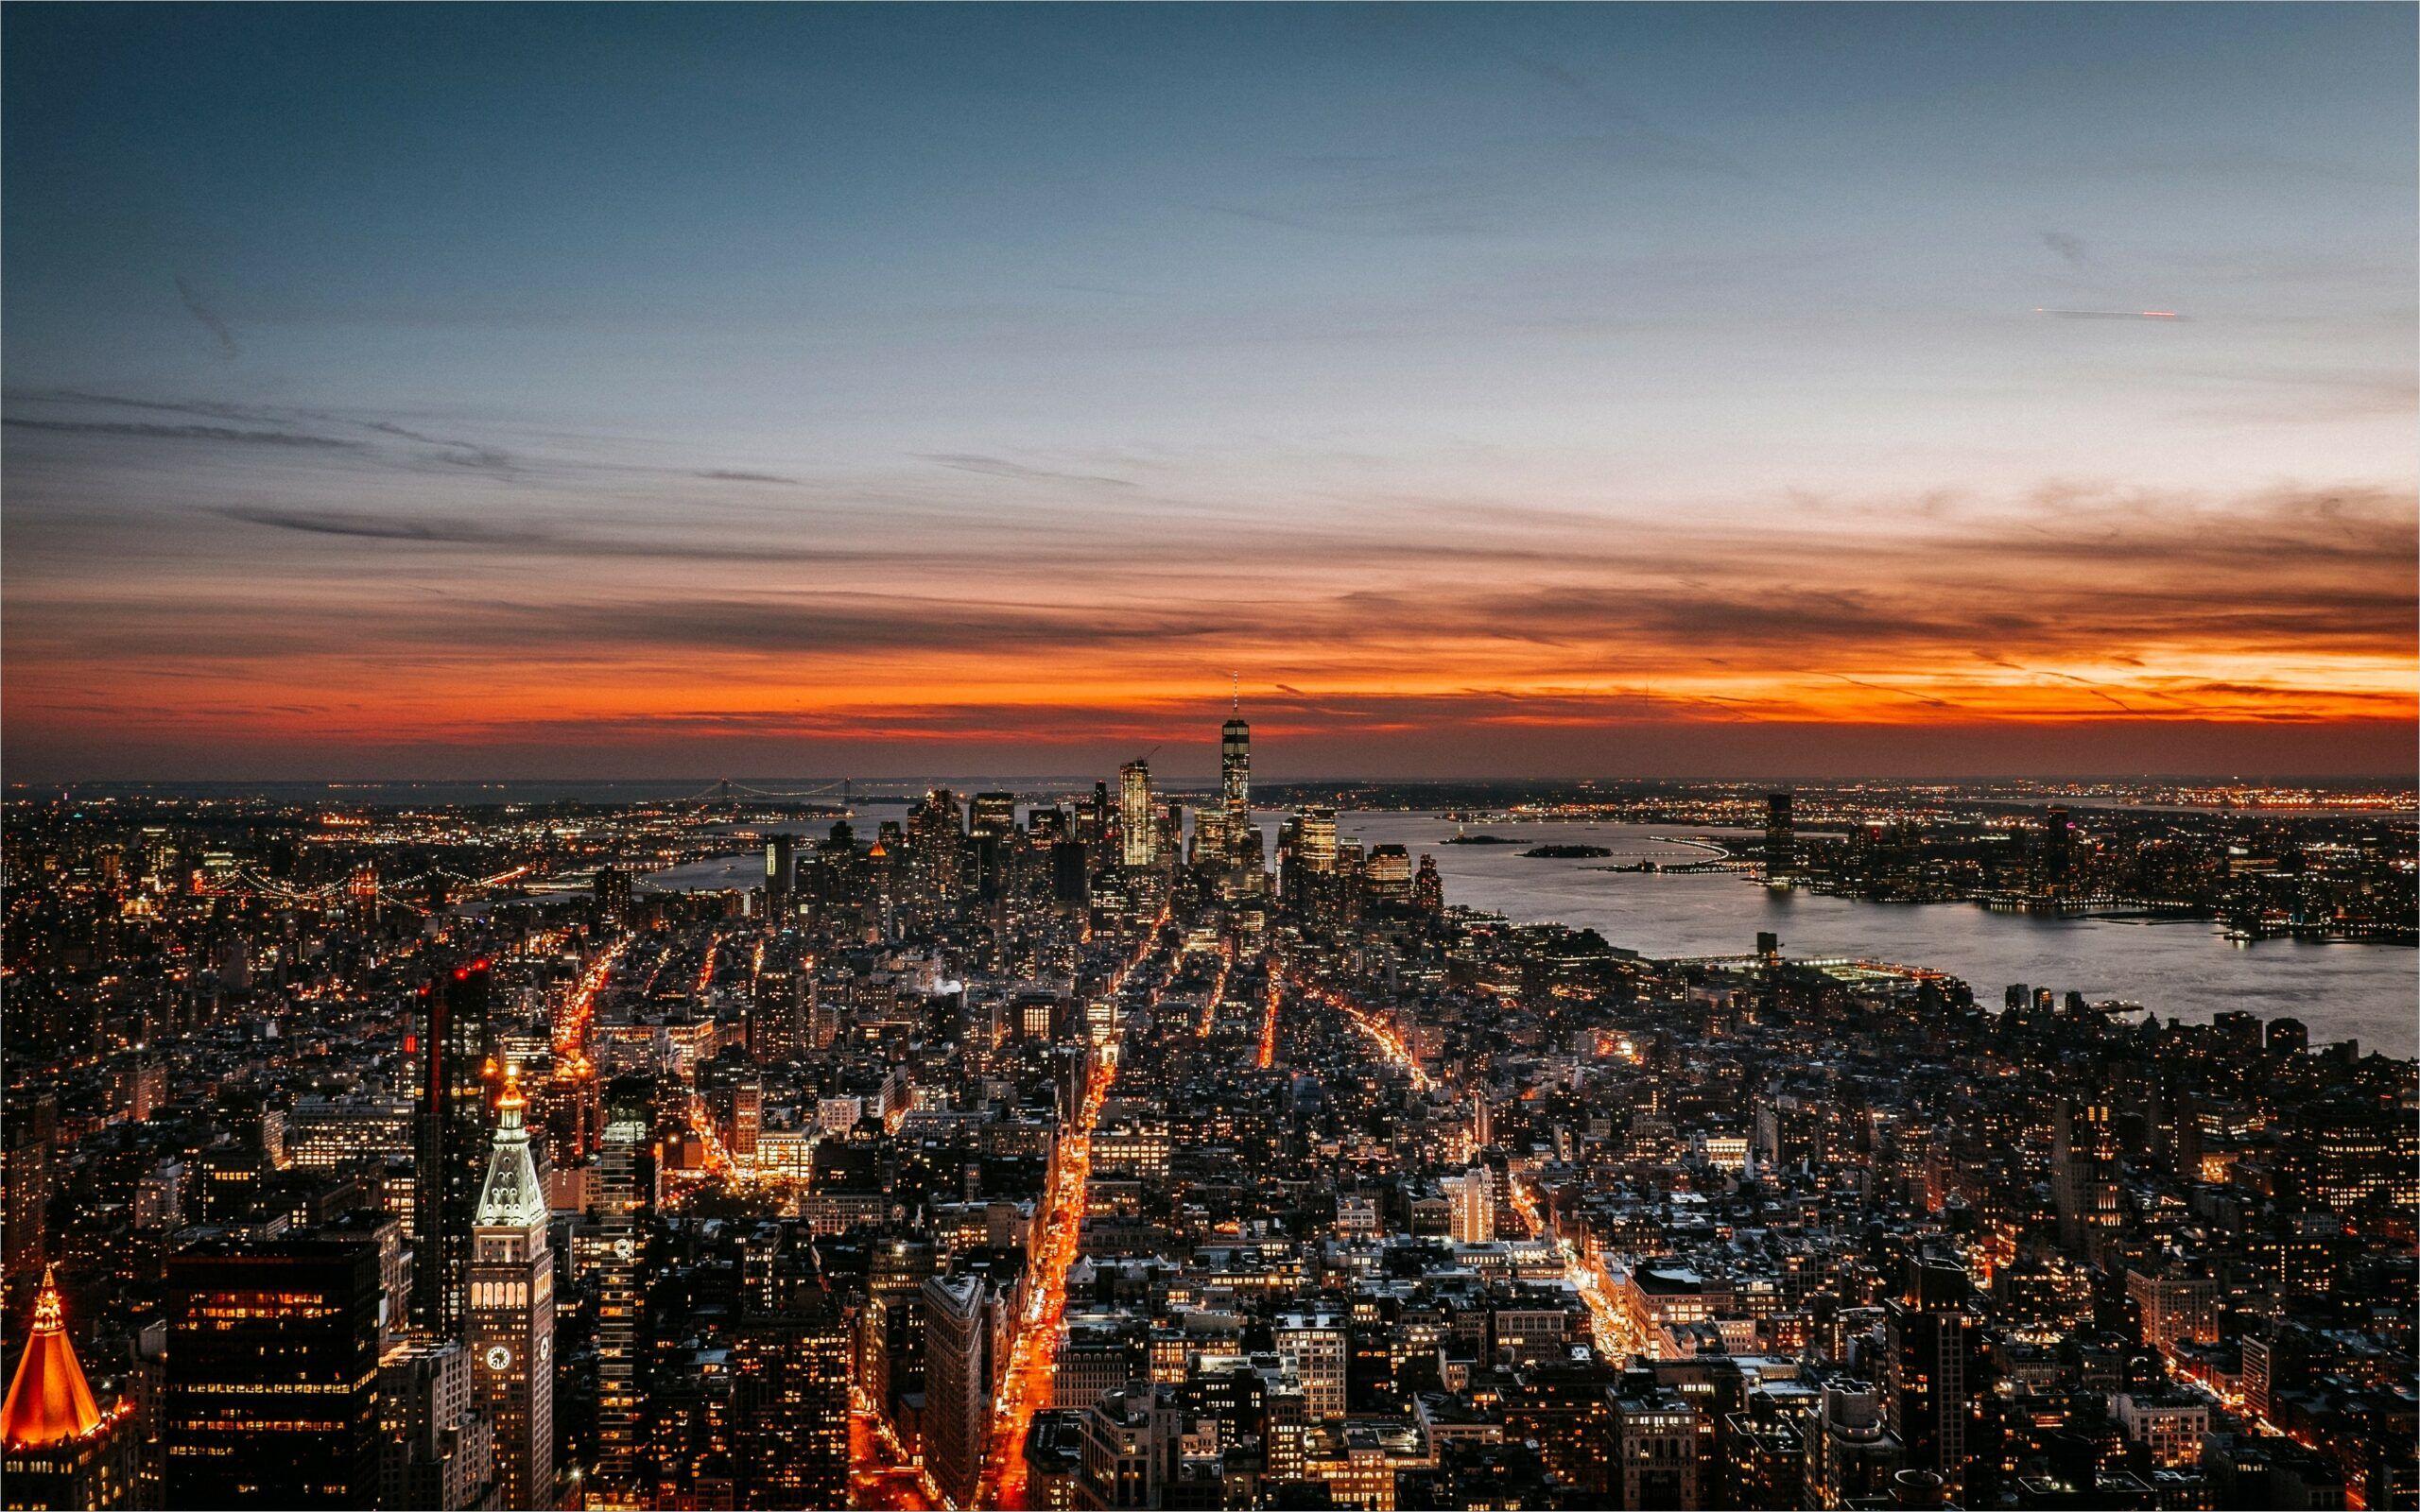 4k Wallpaper City Skyline in 2020 New york city images City 2560x1600